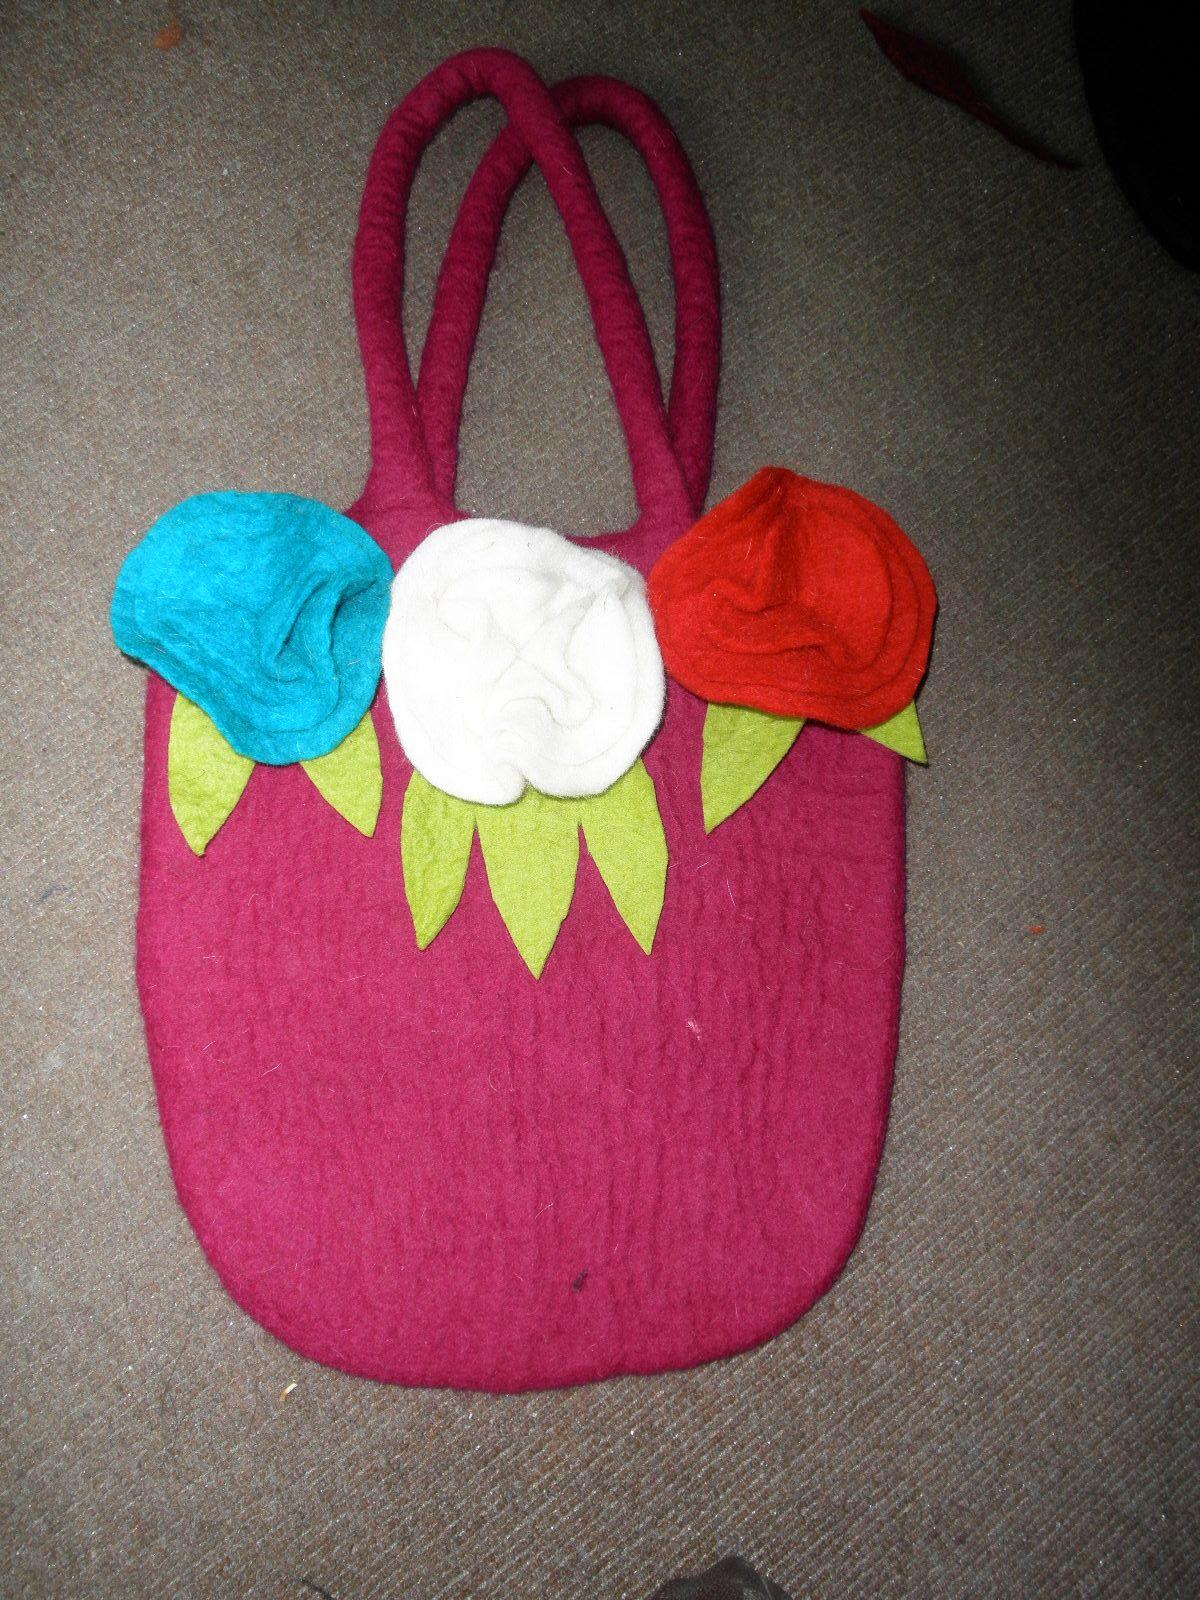 Wool Craft Ideas For Kids Part - 48: Felt Wool DIY U0026 Crafts Felt Wool Craft Handicraft Felt Craft Supplies Felt  Craft Design Felt Craft Patterns Felt Craft Ideas Felt Craft For Kids Felt  Craft ...